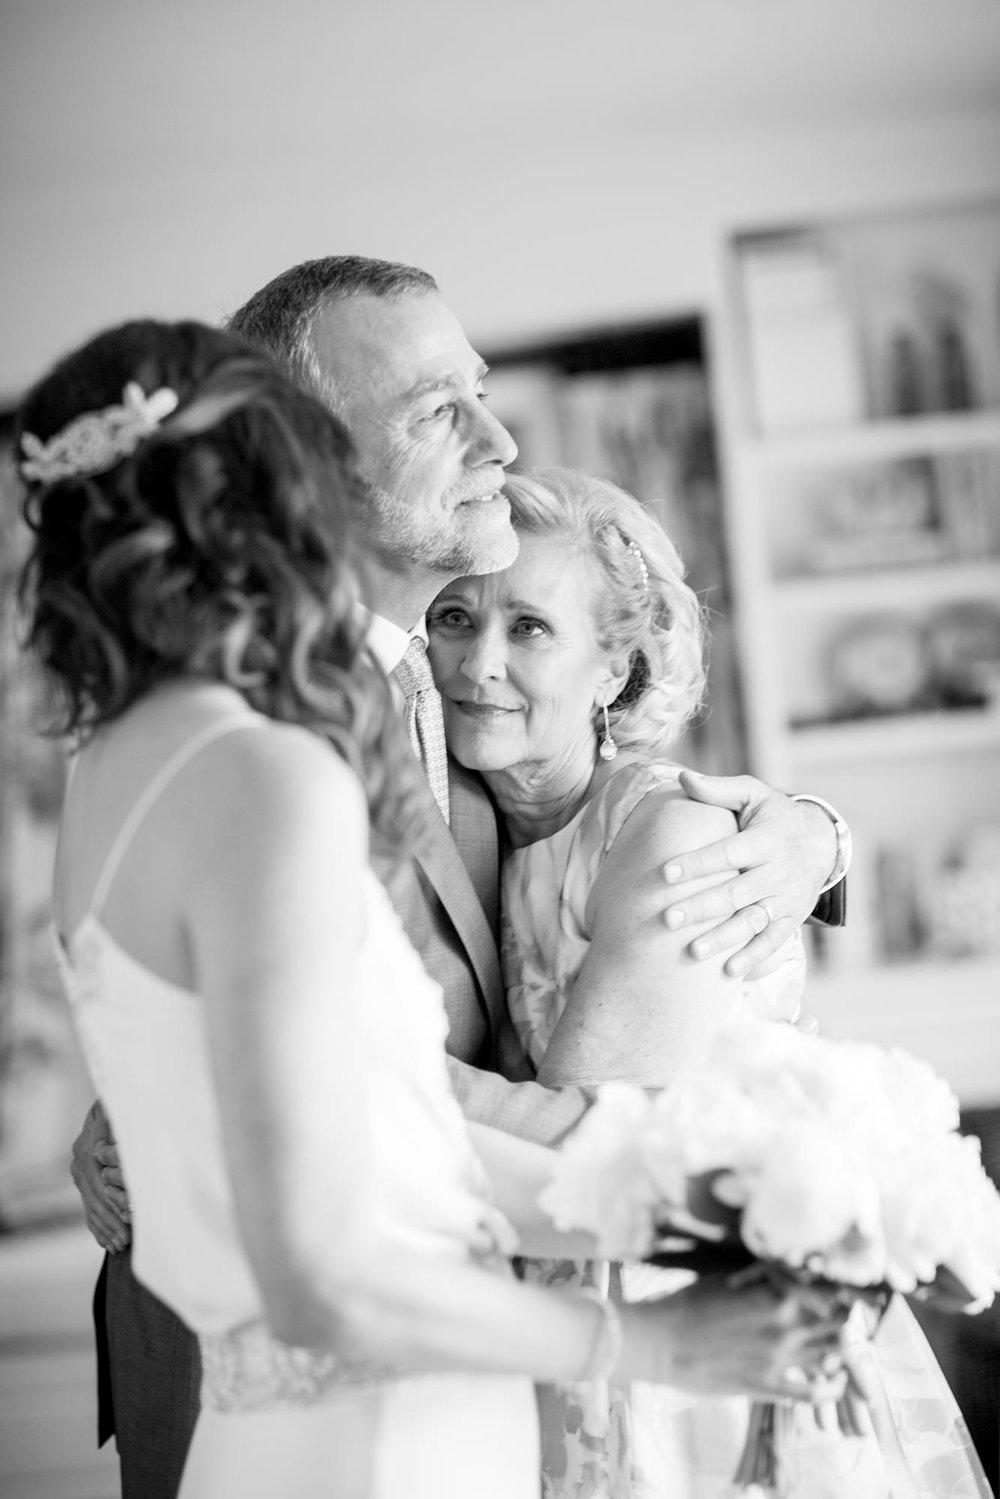 Palos Verdes Private Estate Wedding | Miki & Sonja Photography | mikiandsonja.com